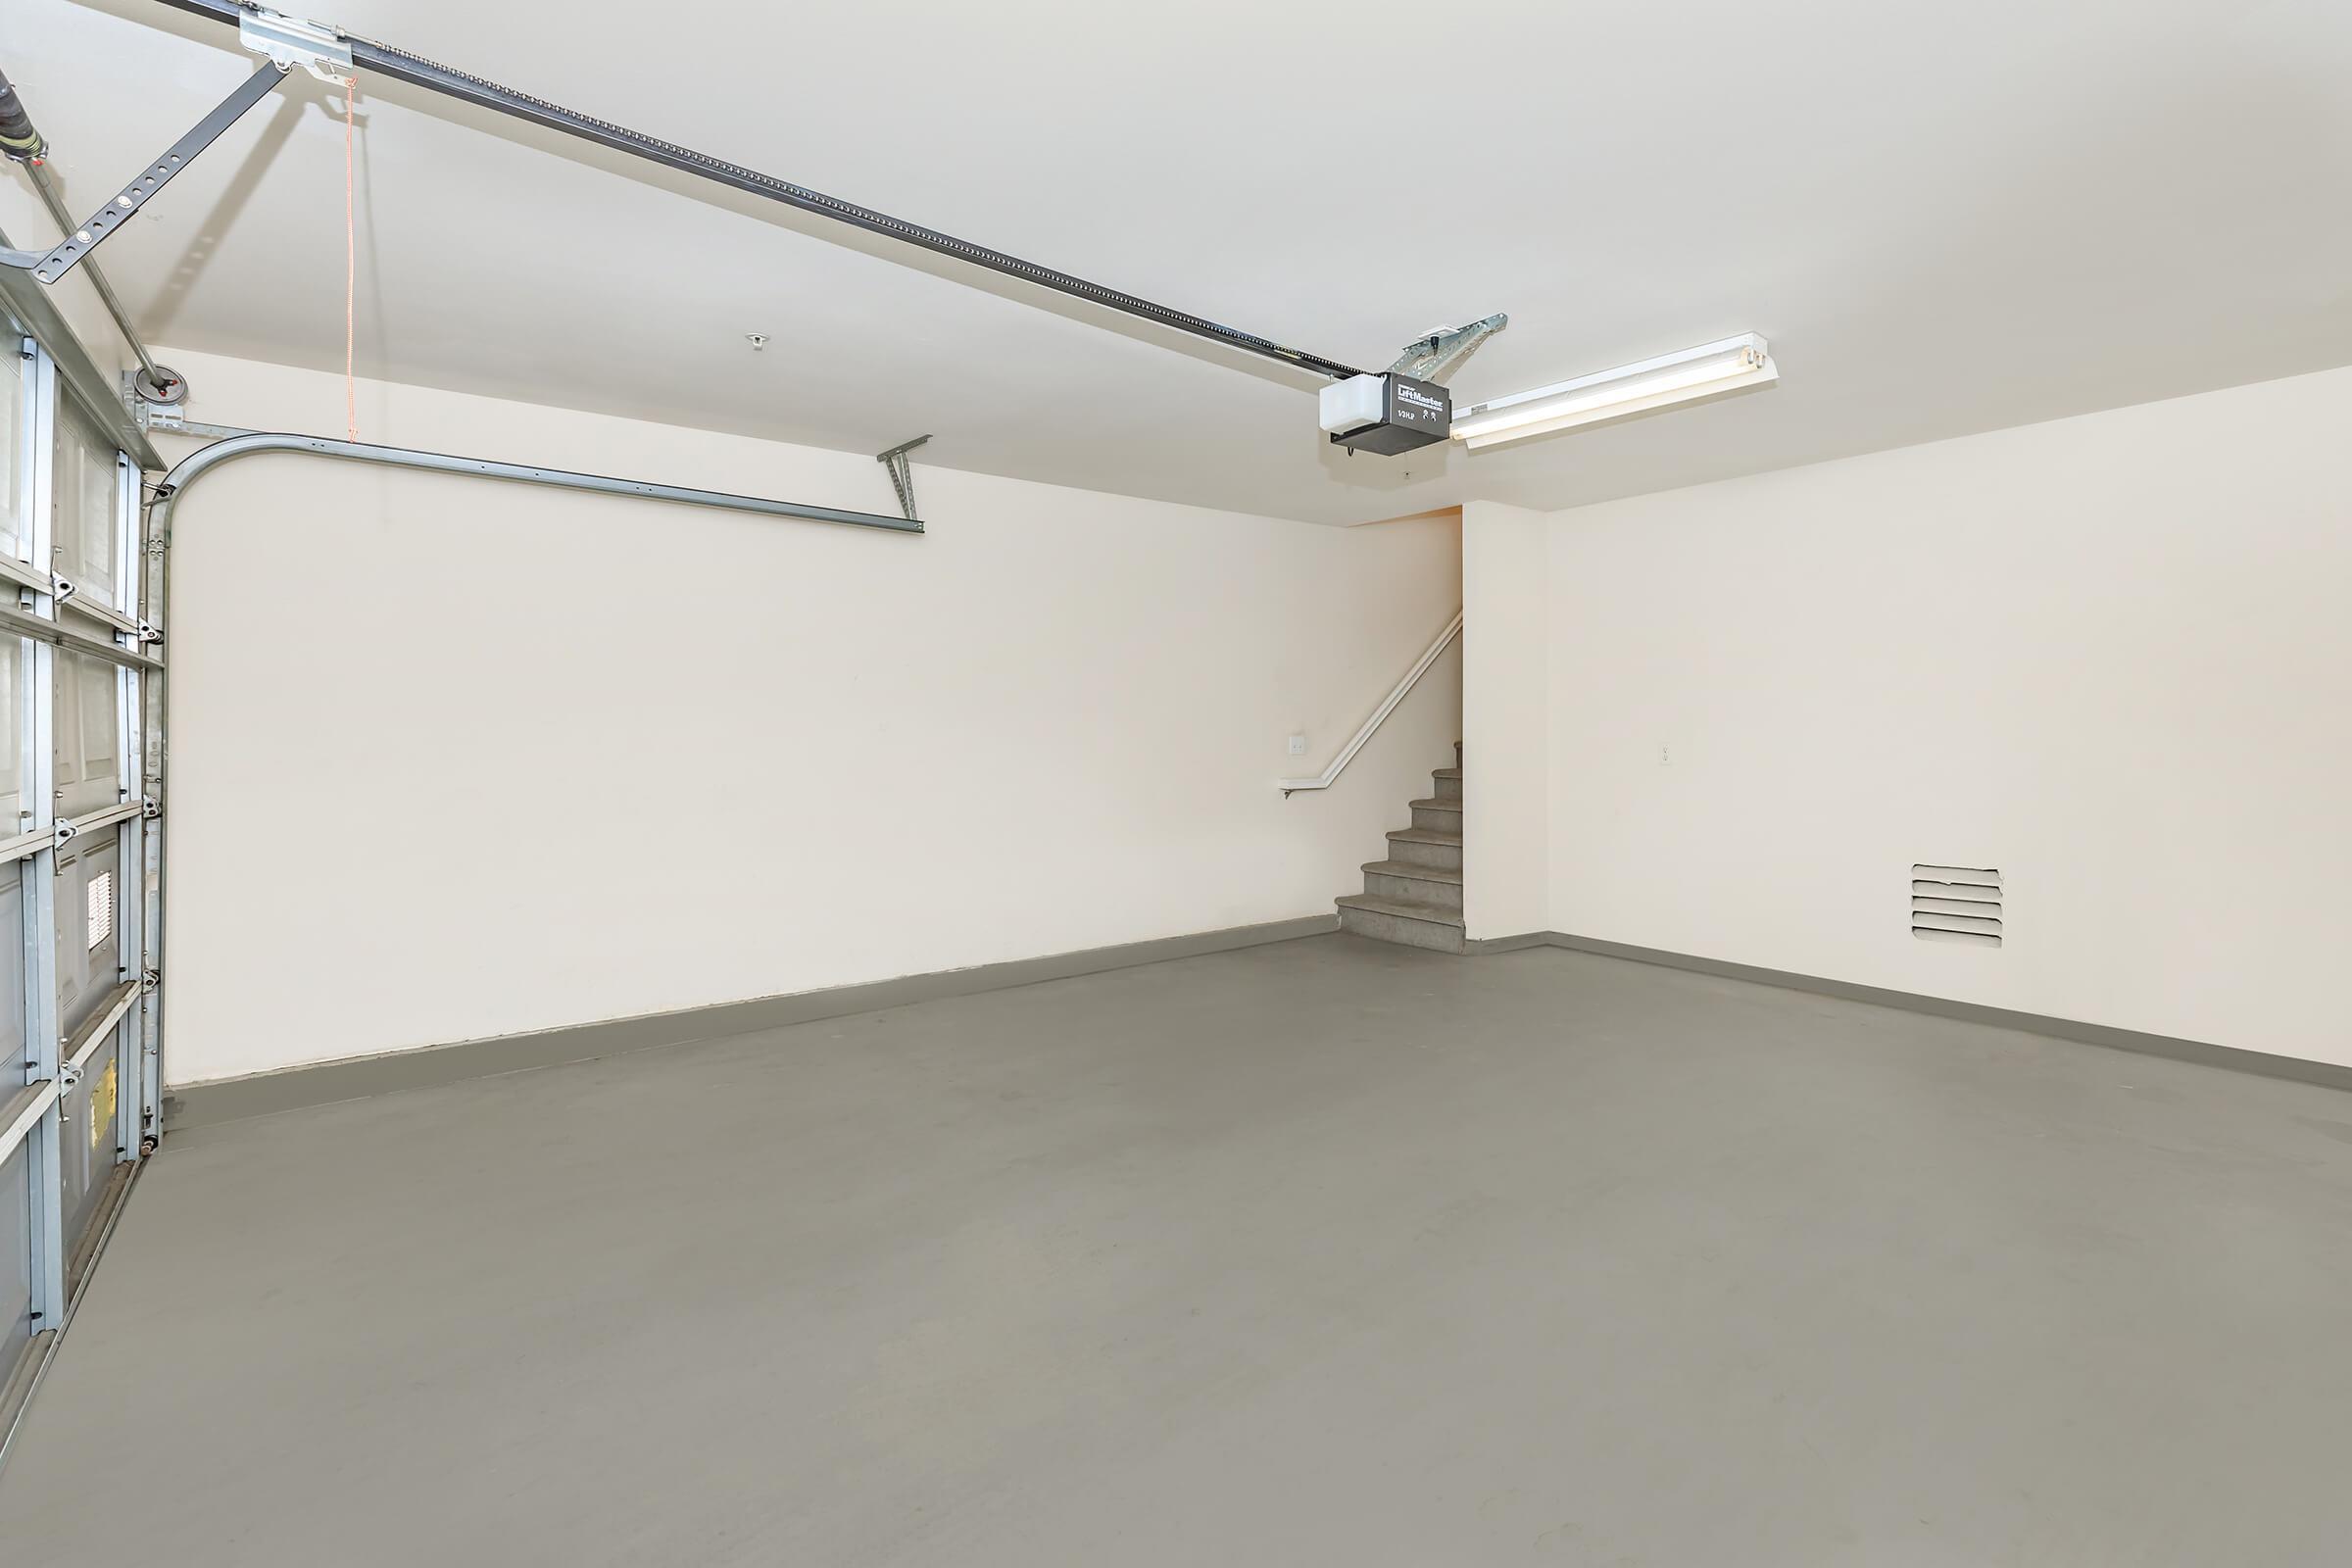 Vacant garage